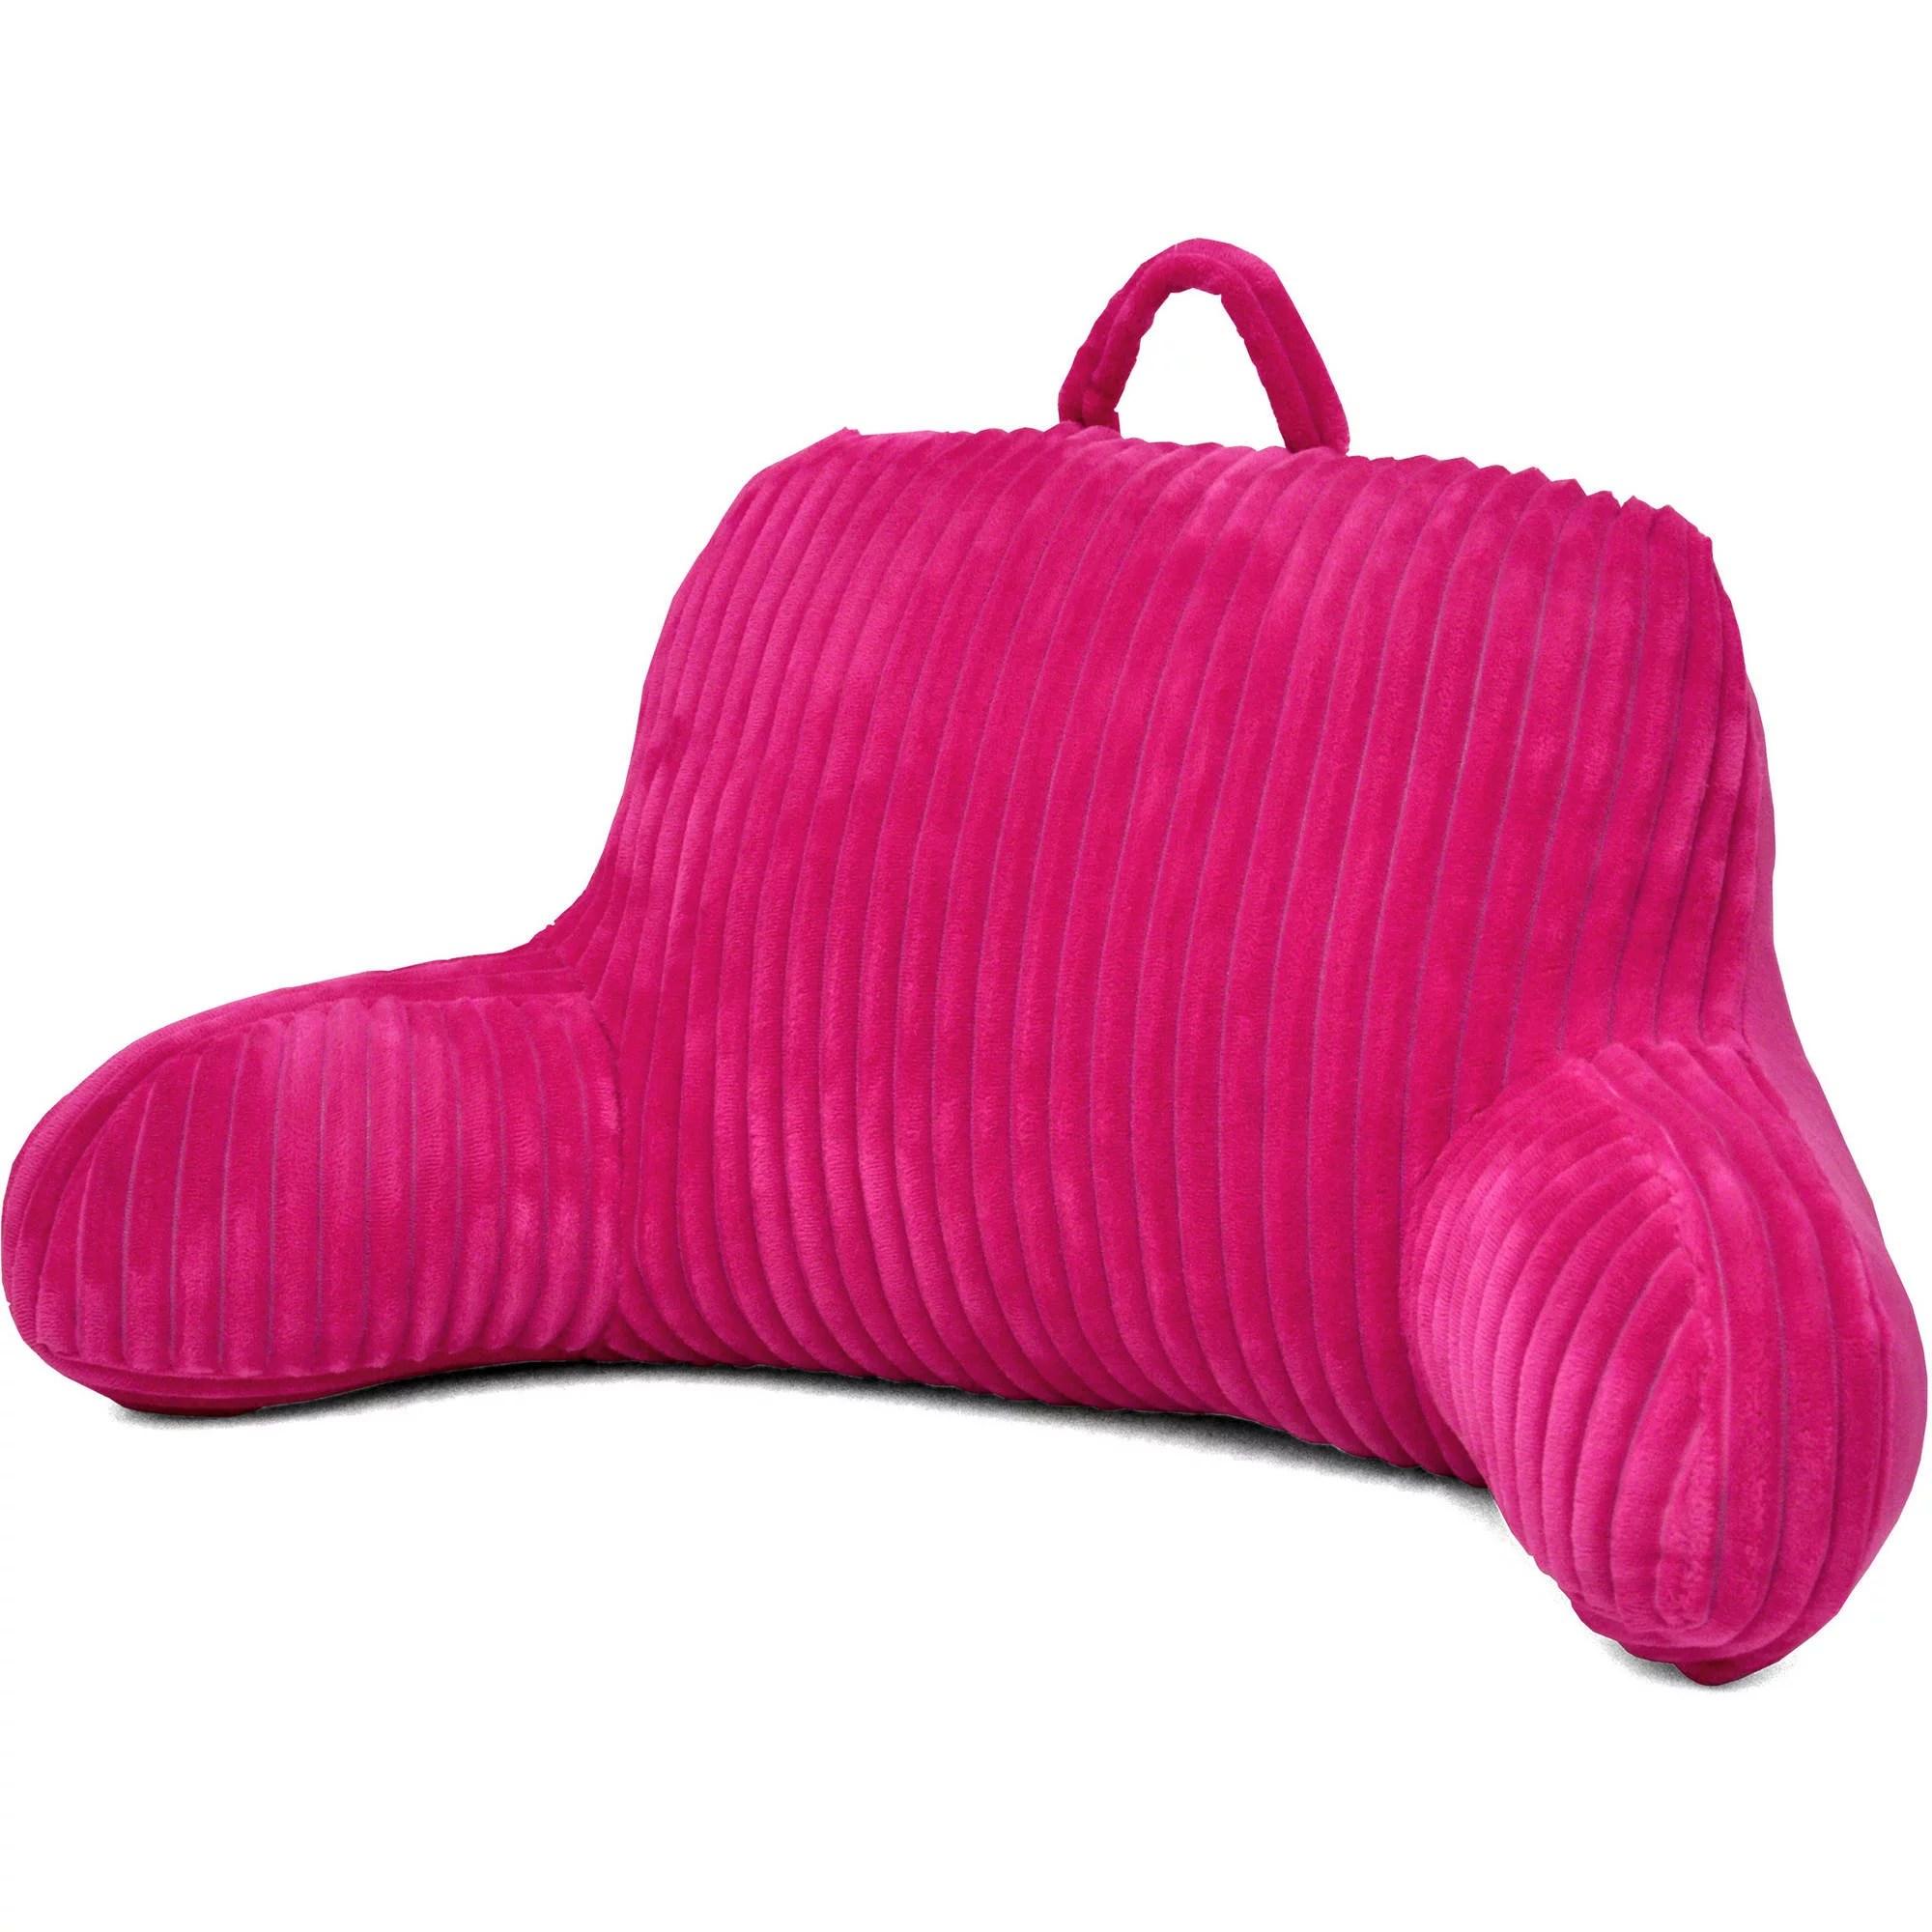 Formula Wide Wale Rev To Micromink Backrest Pillow